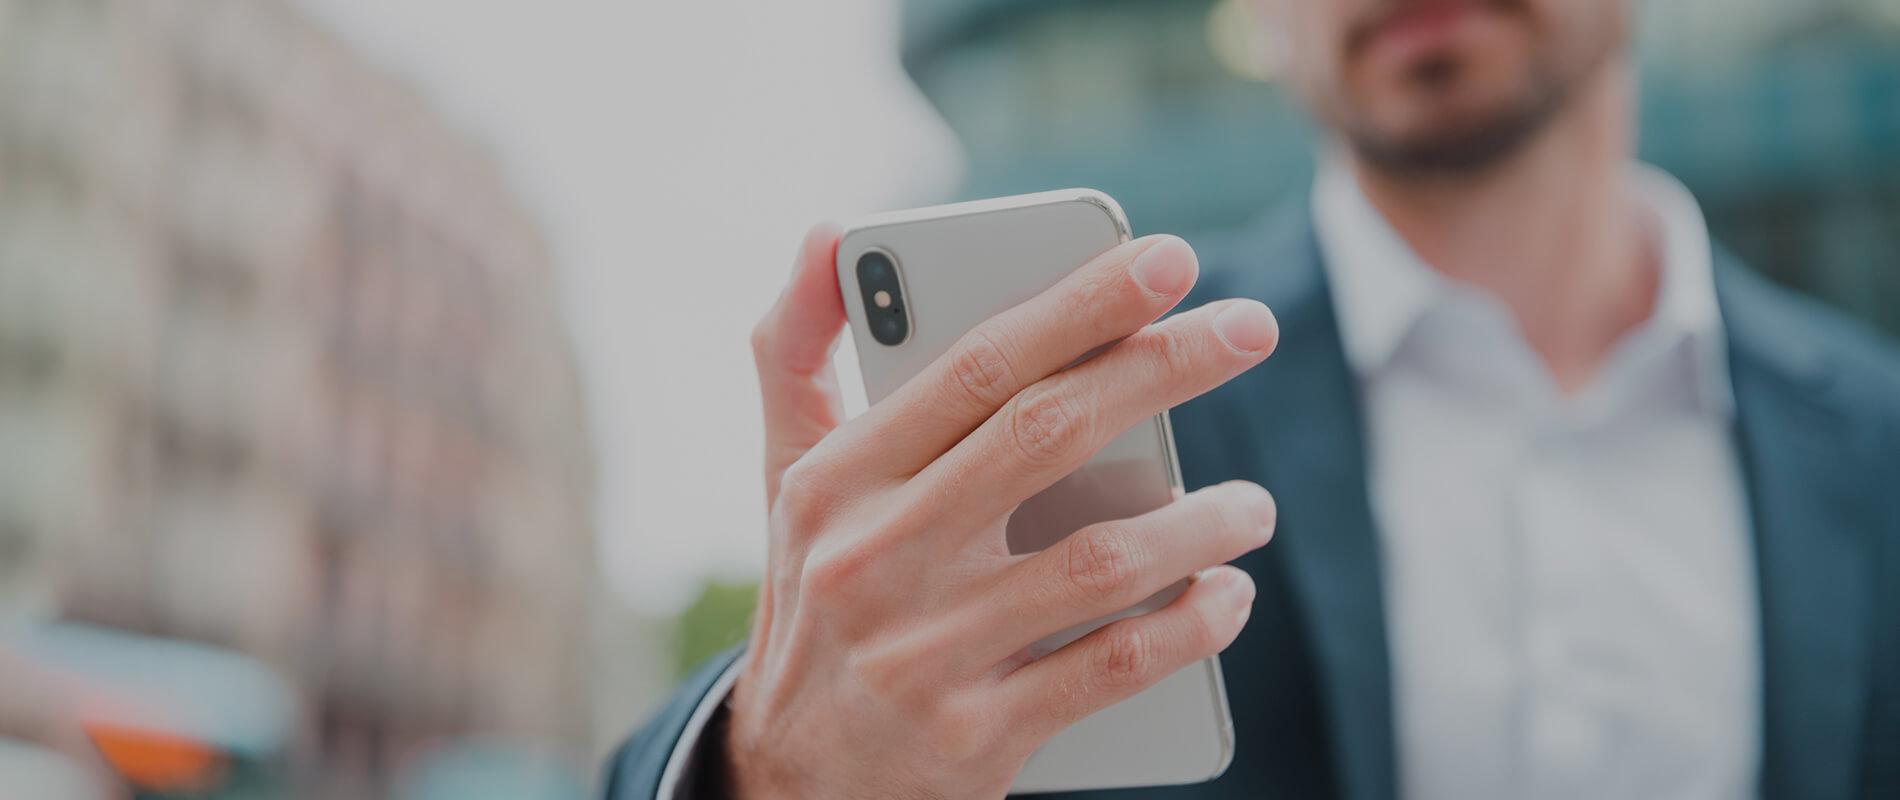 Картинка человек со смартфоном